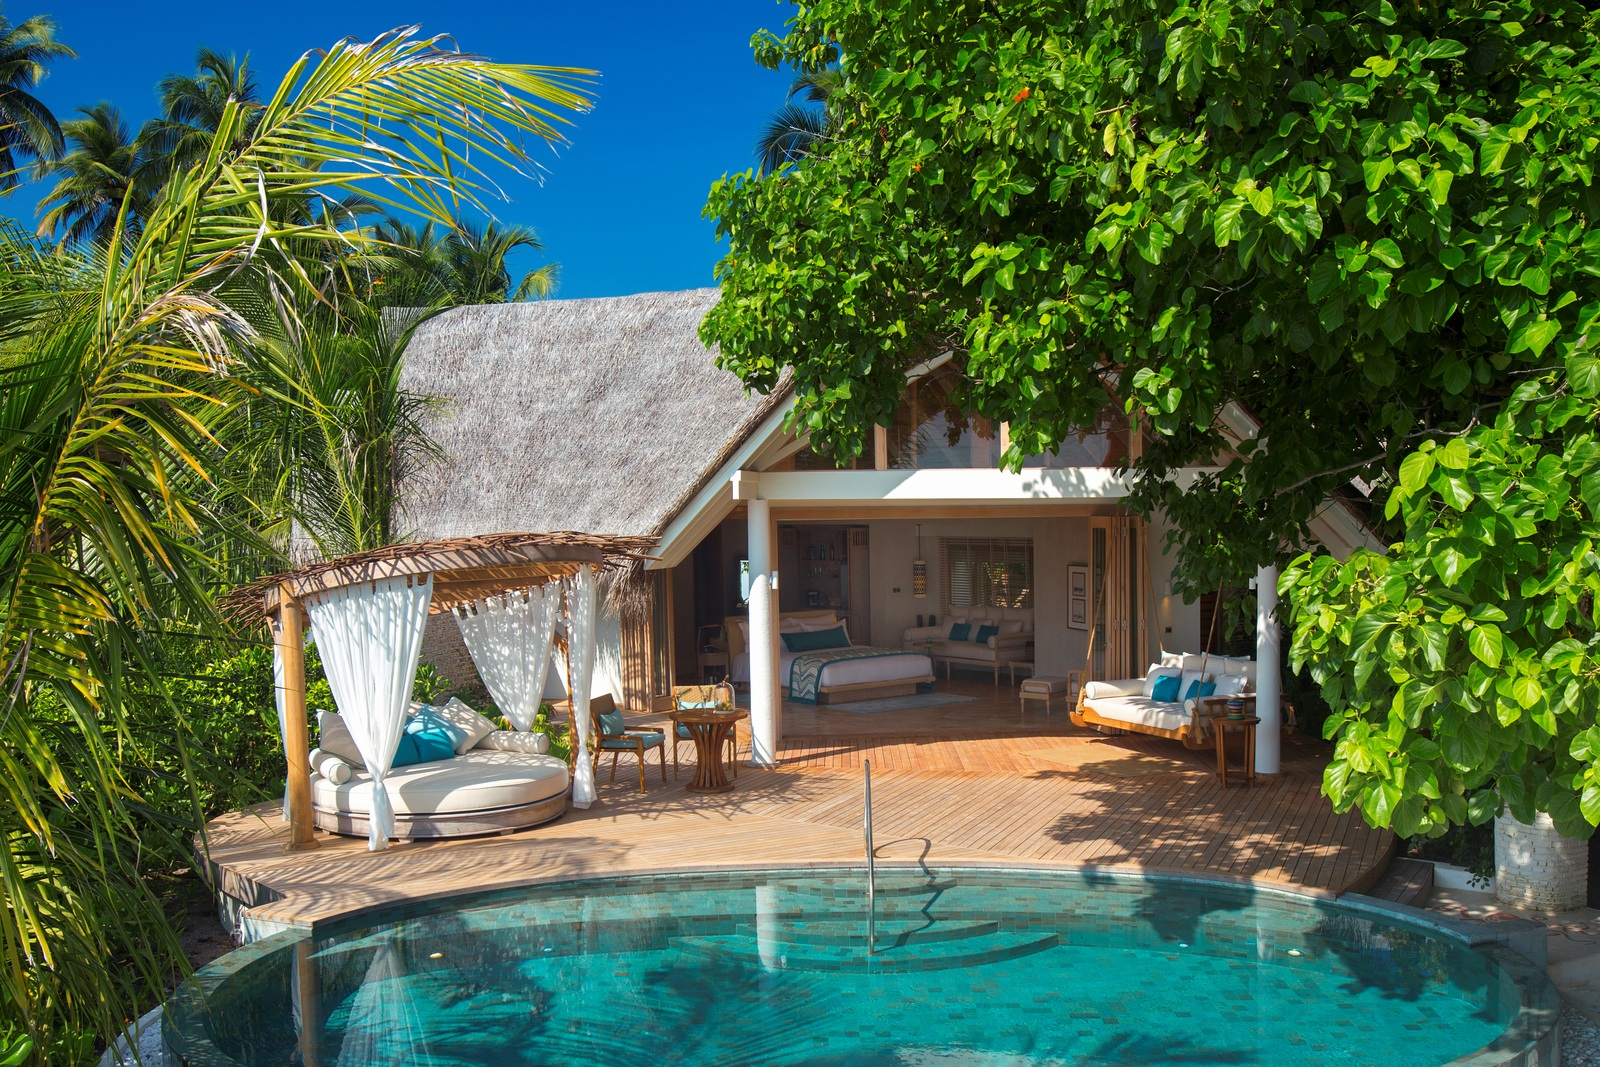 Malediven    die neue Trauminsel Milaidhoo im Baa Atoll strand sonne reisebericht malediven honeymoon 2  TUI Berlin Reisebüro Malediven Milaidhoo Beachvilla mit Pool